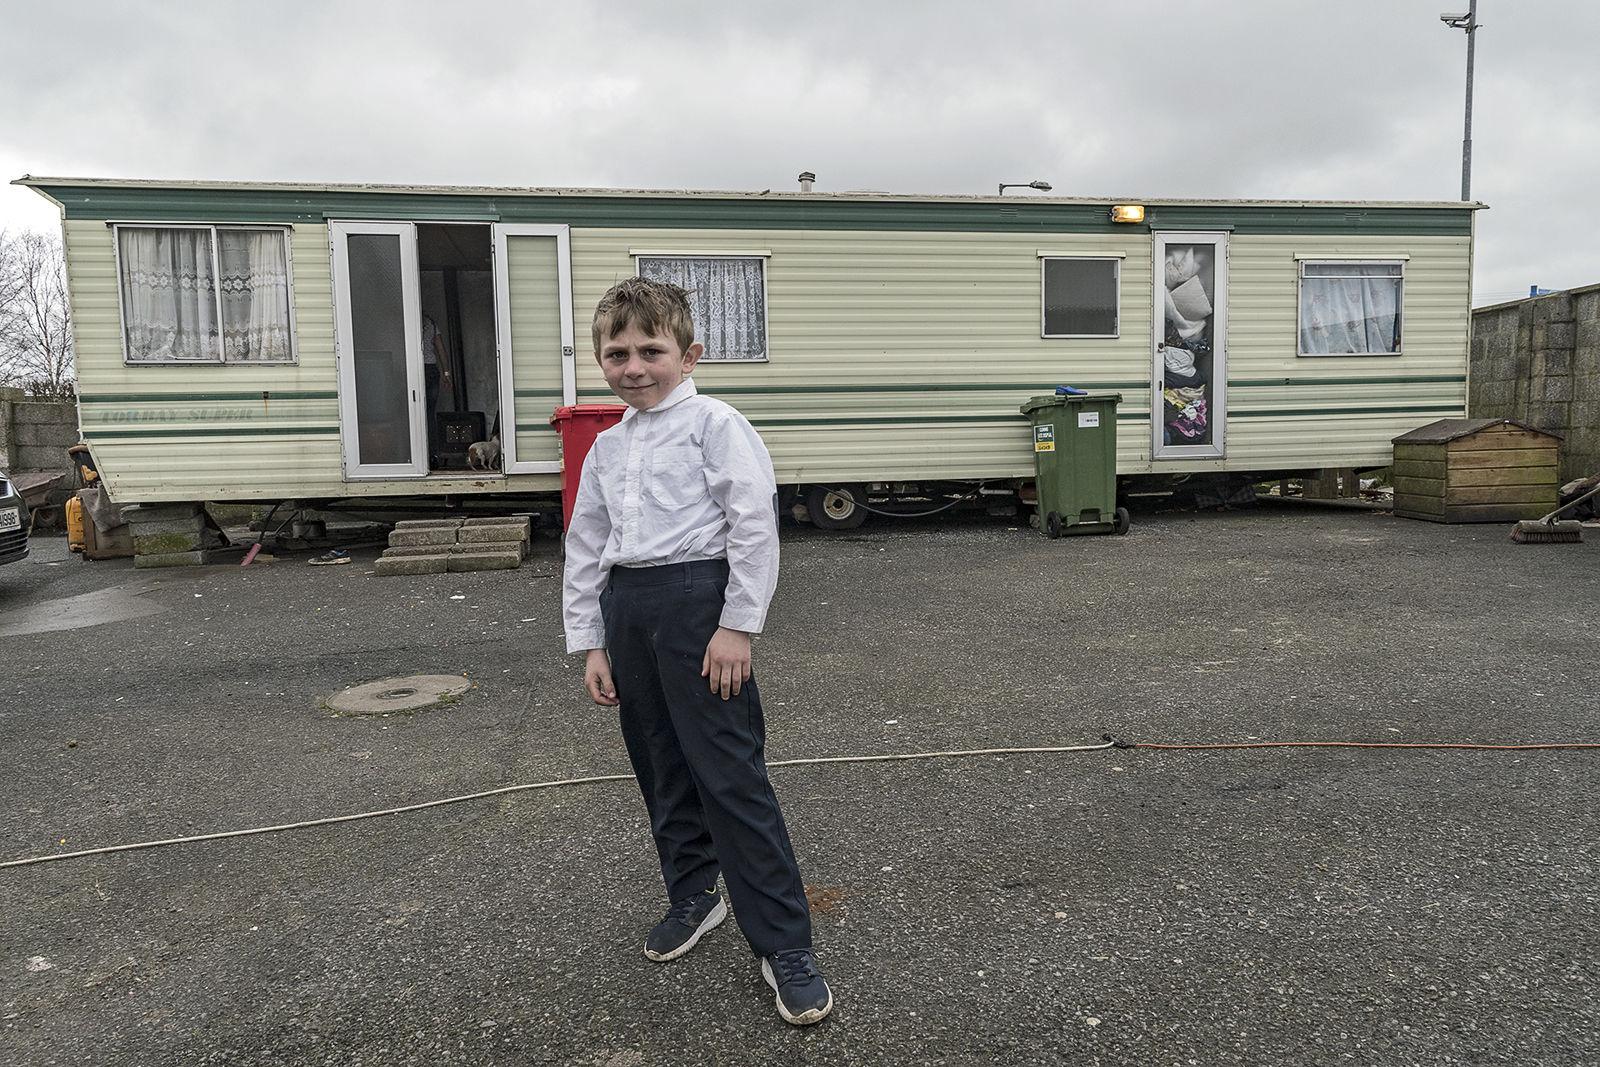 Kevin, Tipperary, Ireland 2020